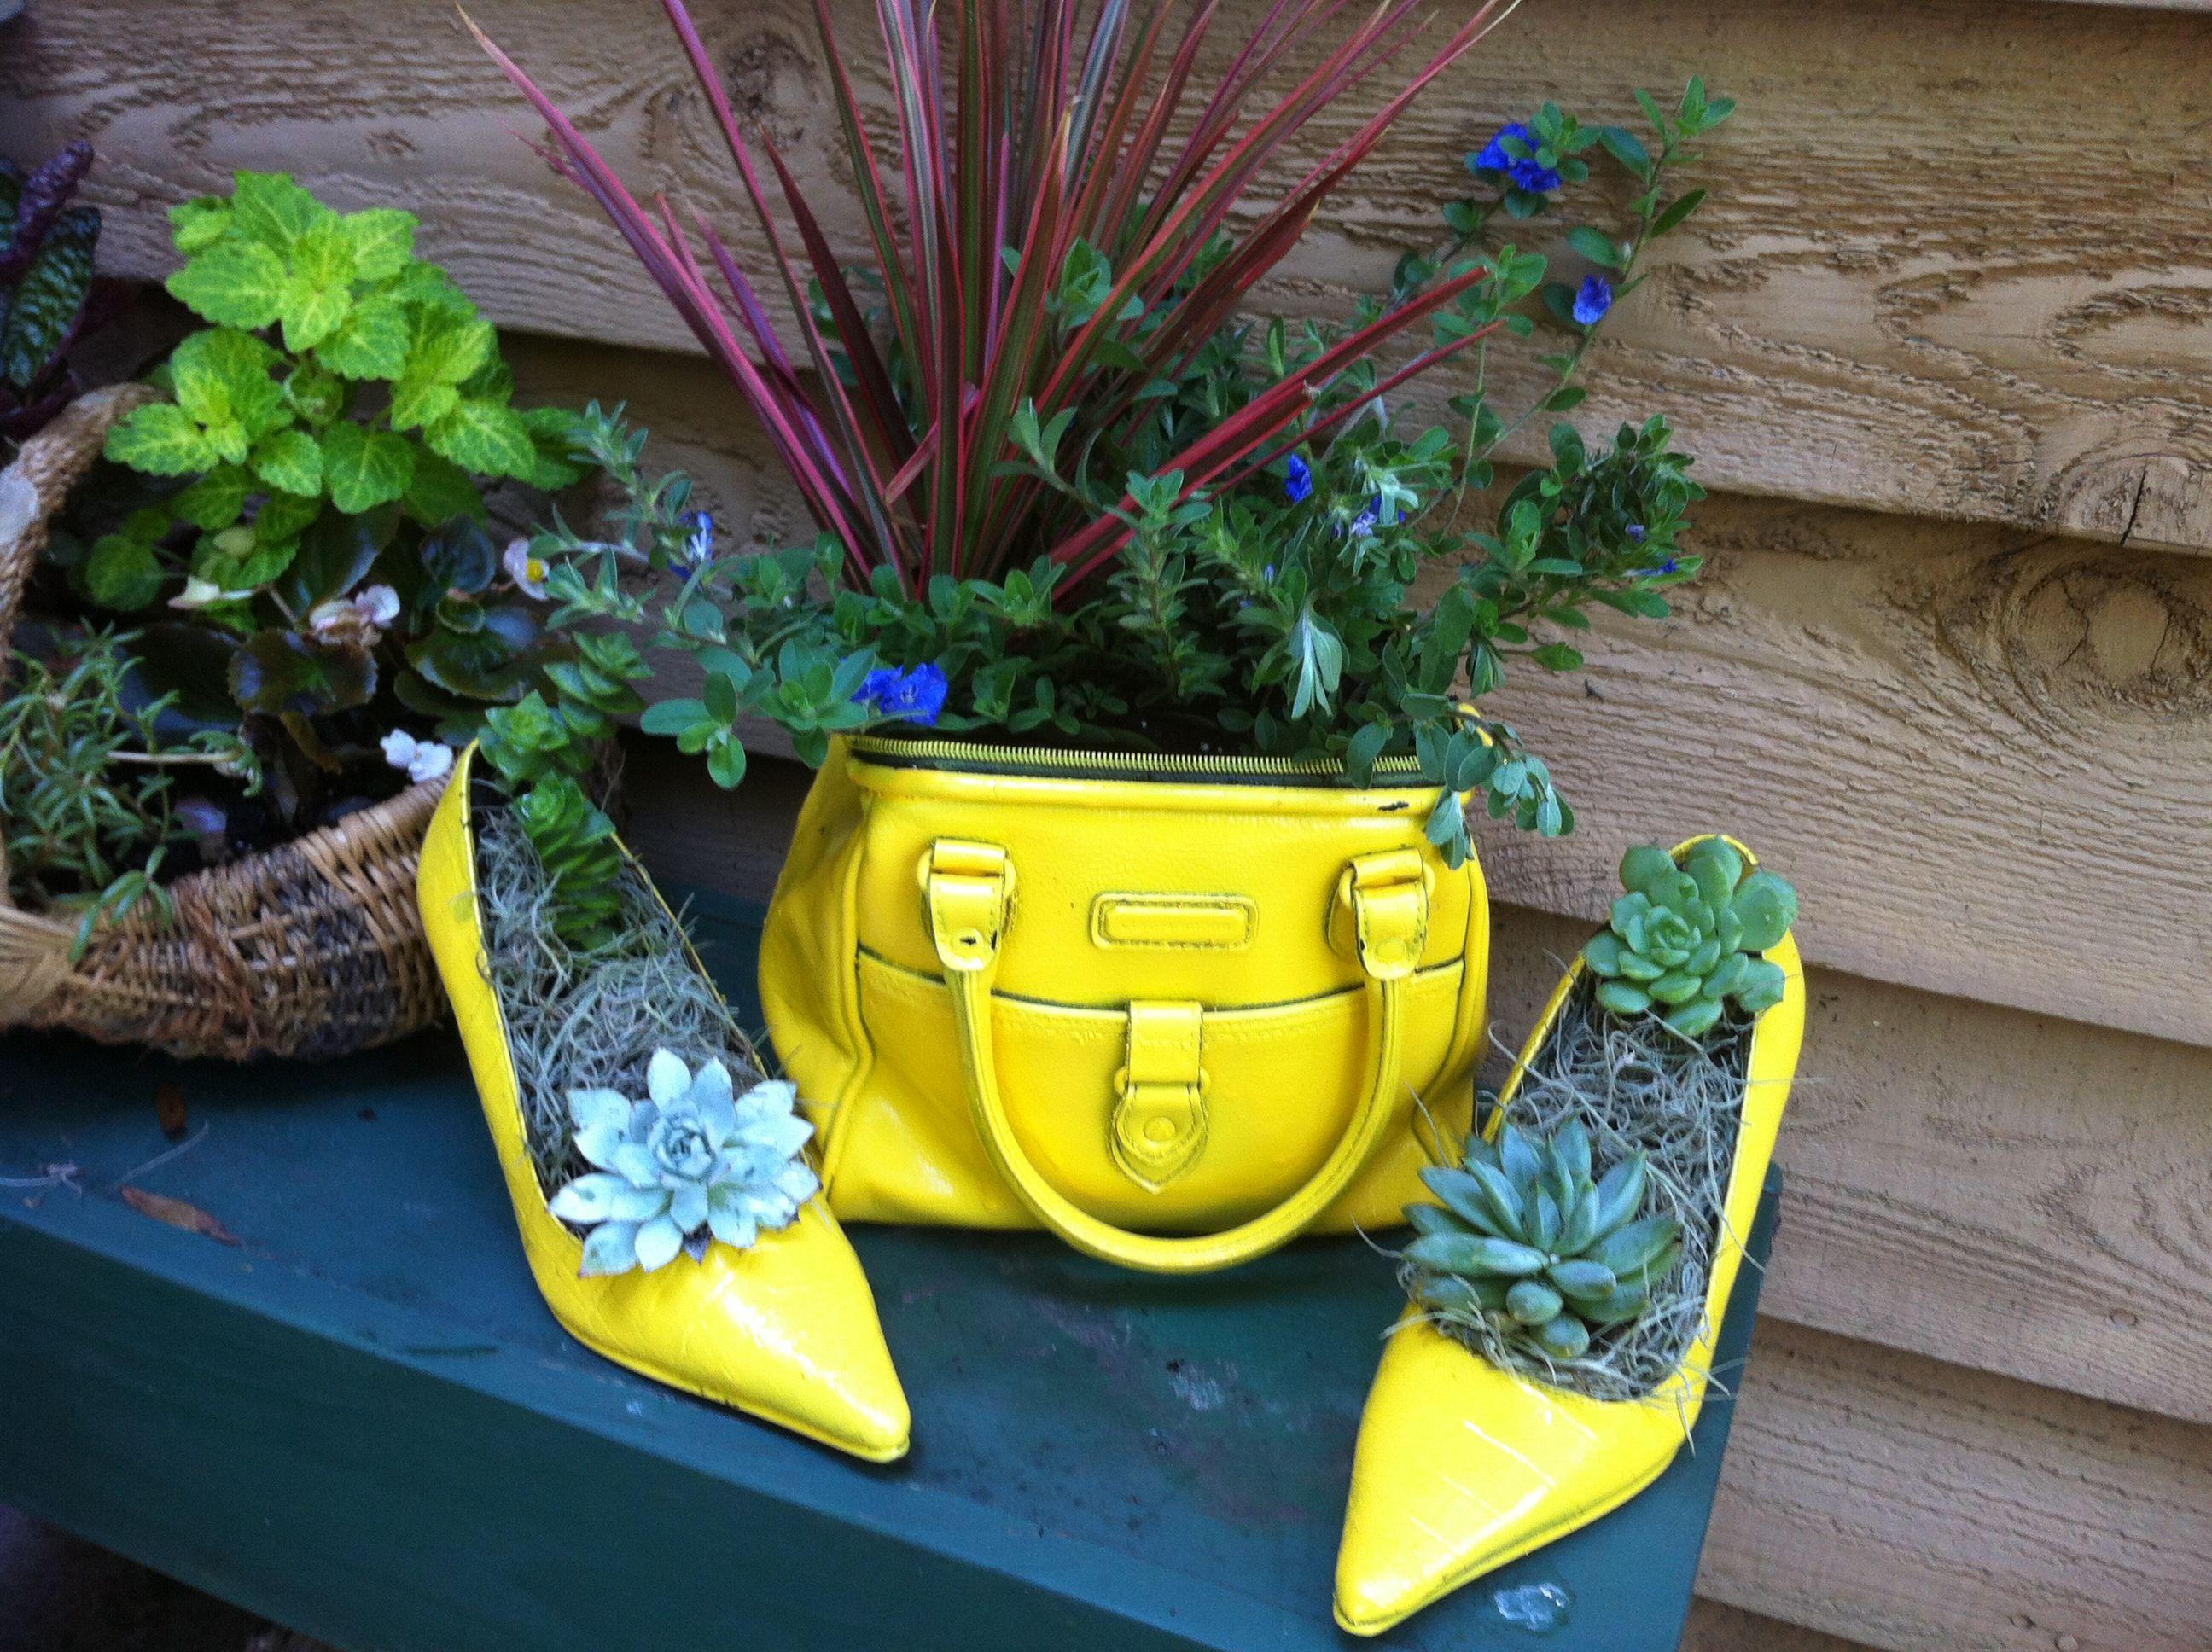 Pin By Lynn Pushman On Gardening Recycled Planters Garden